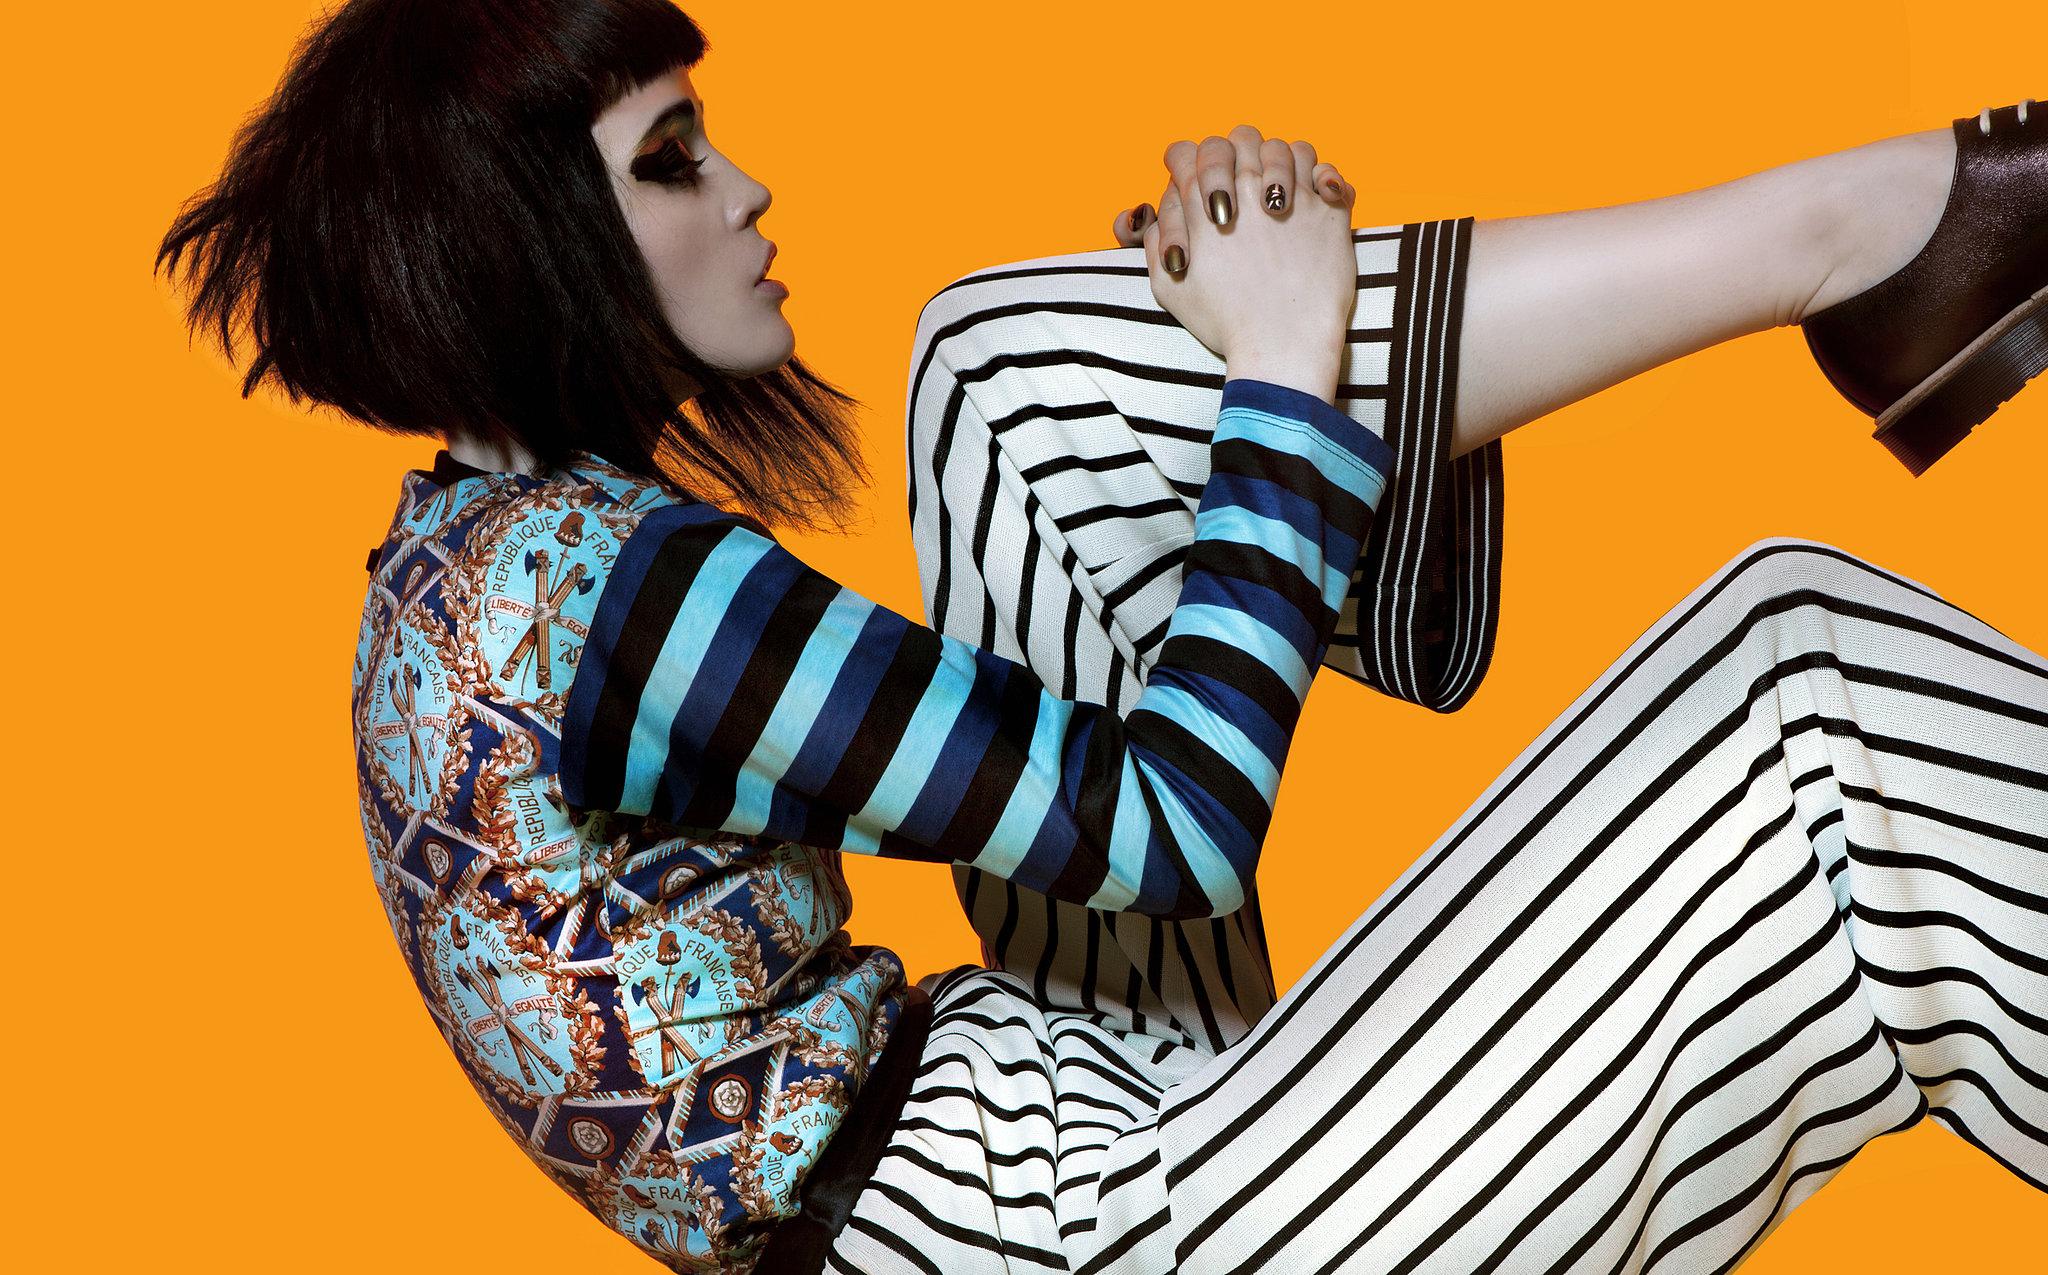 blouse ($769) Photo courtesy of Farfetch